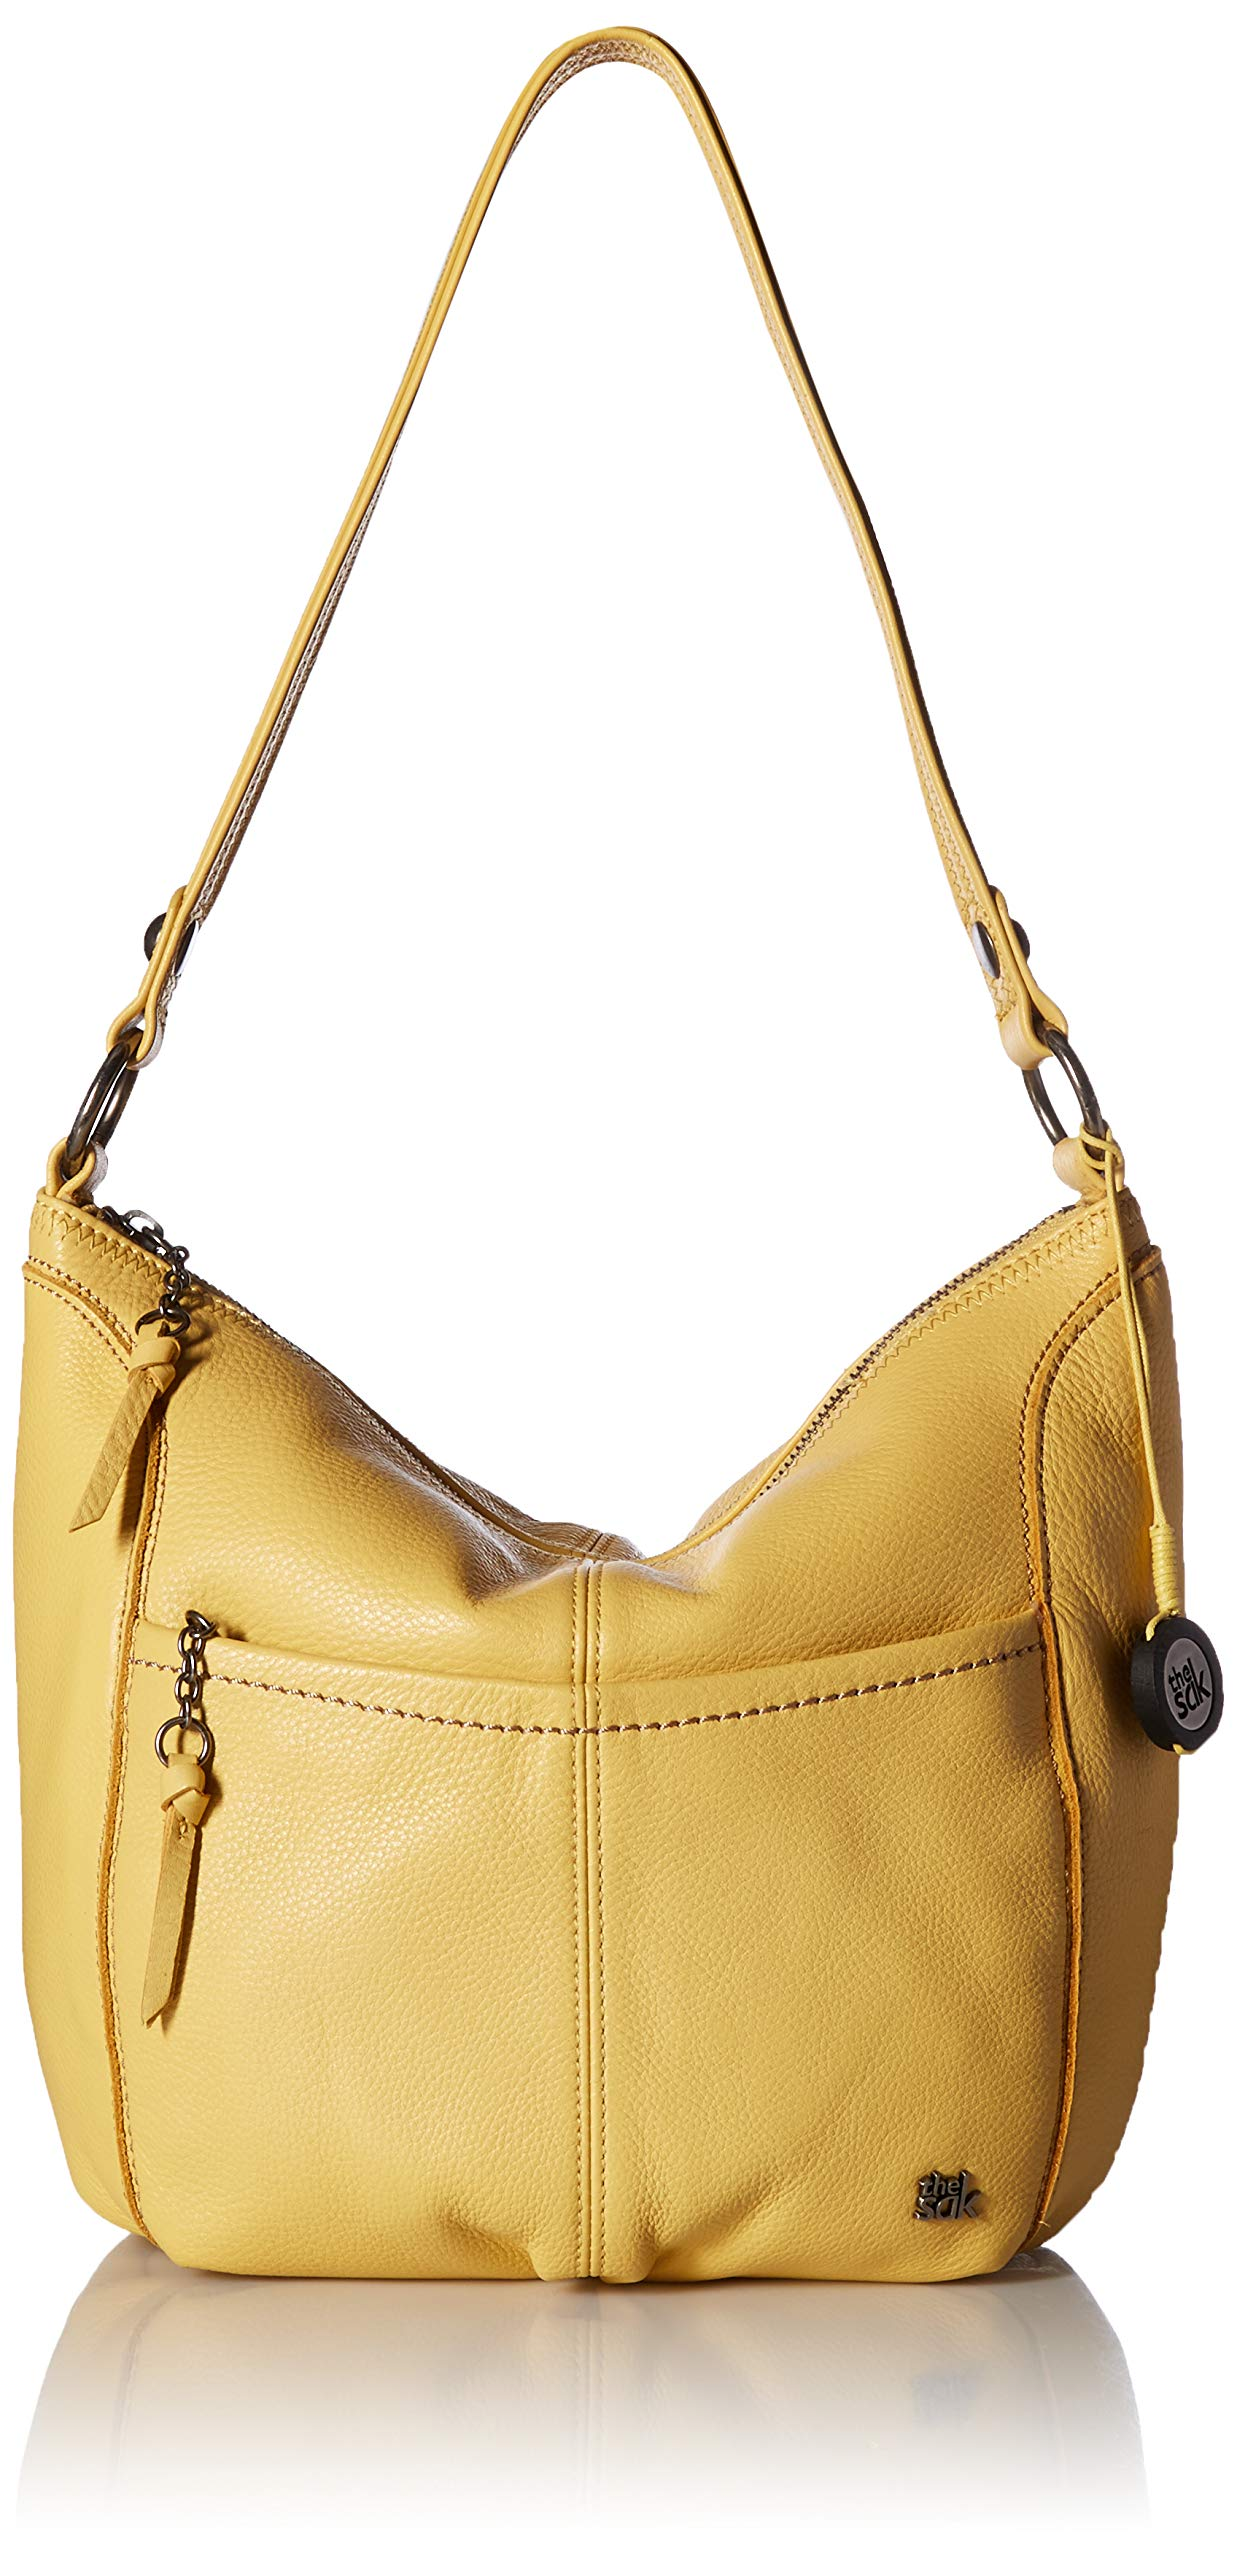 Iris Large Hobo Hobo Bag, sunlight